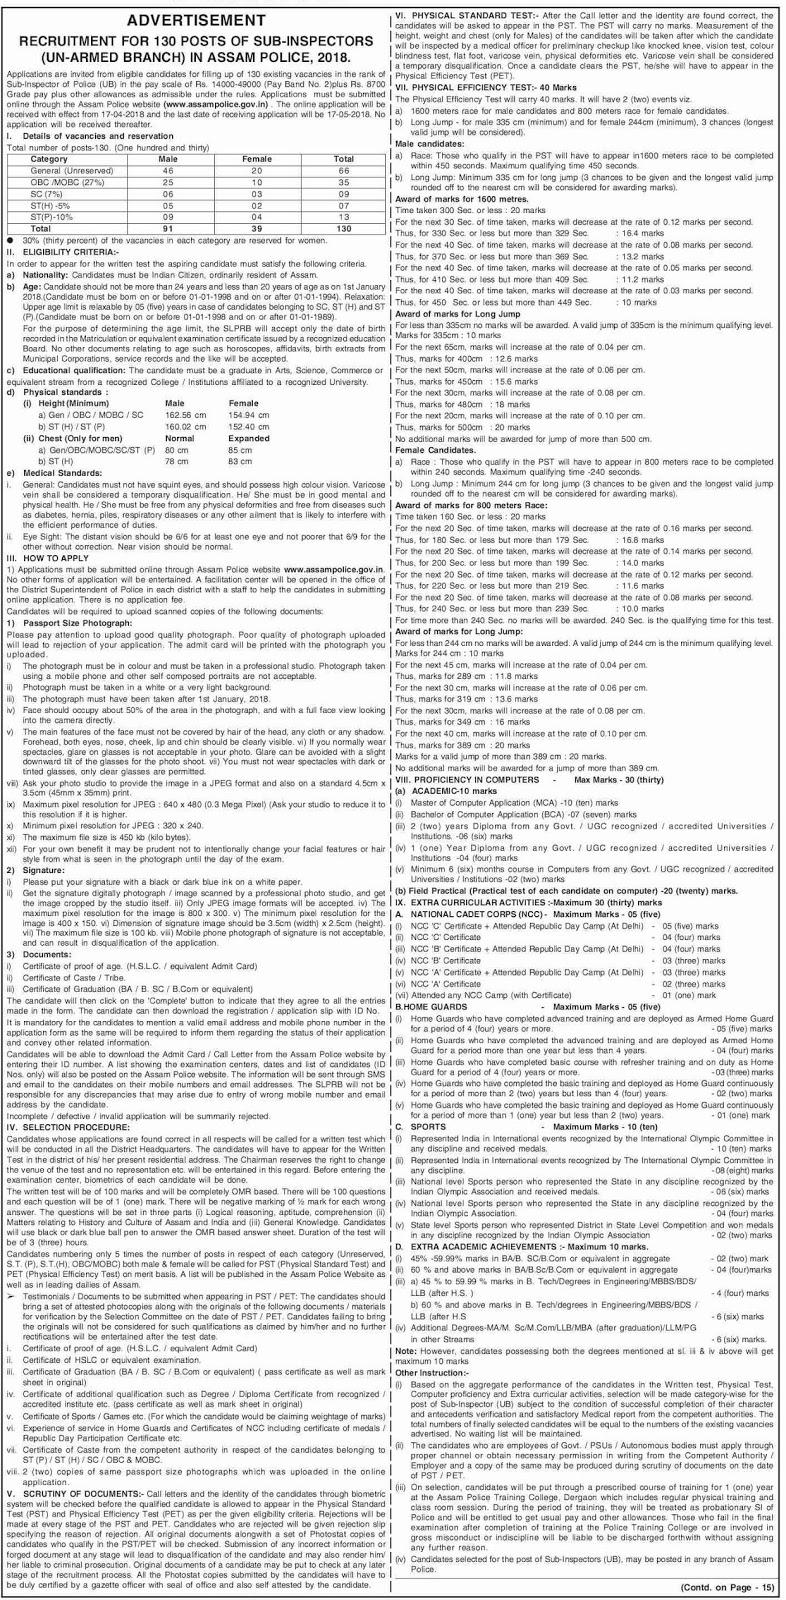 Assam Sub Inspector of Police Recruitment 2018 Govt Jobs